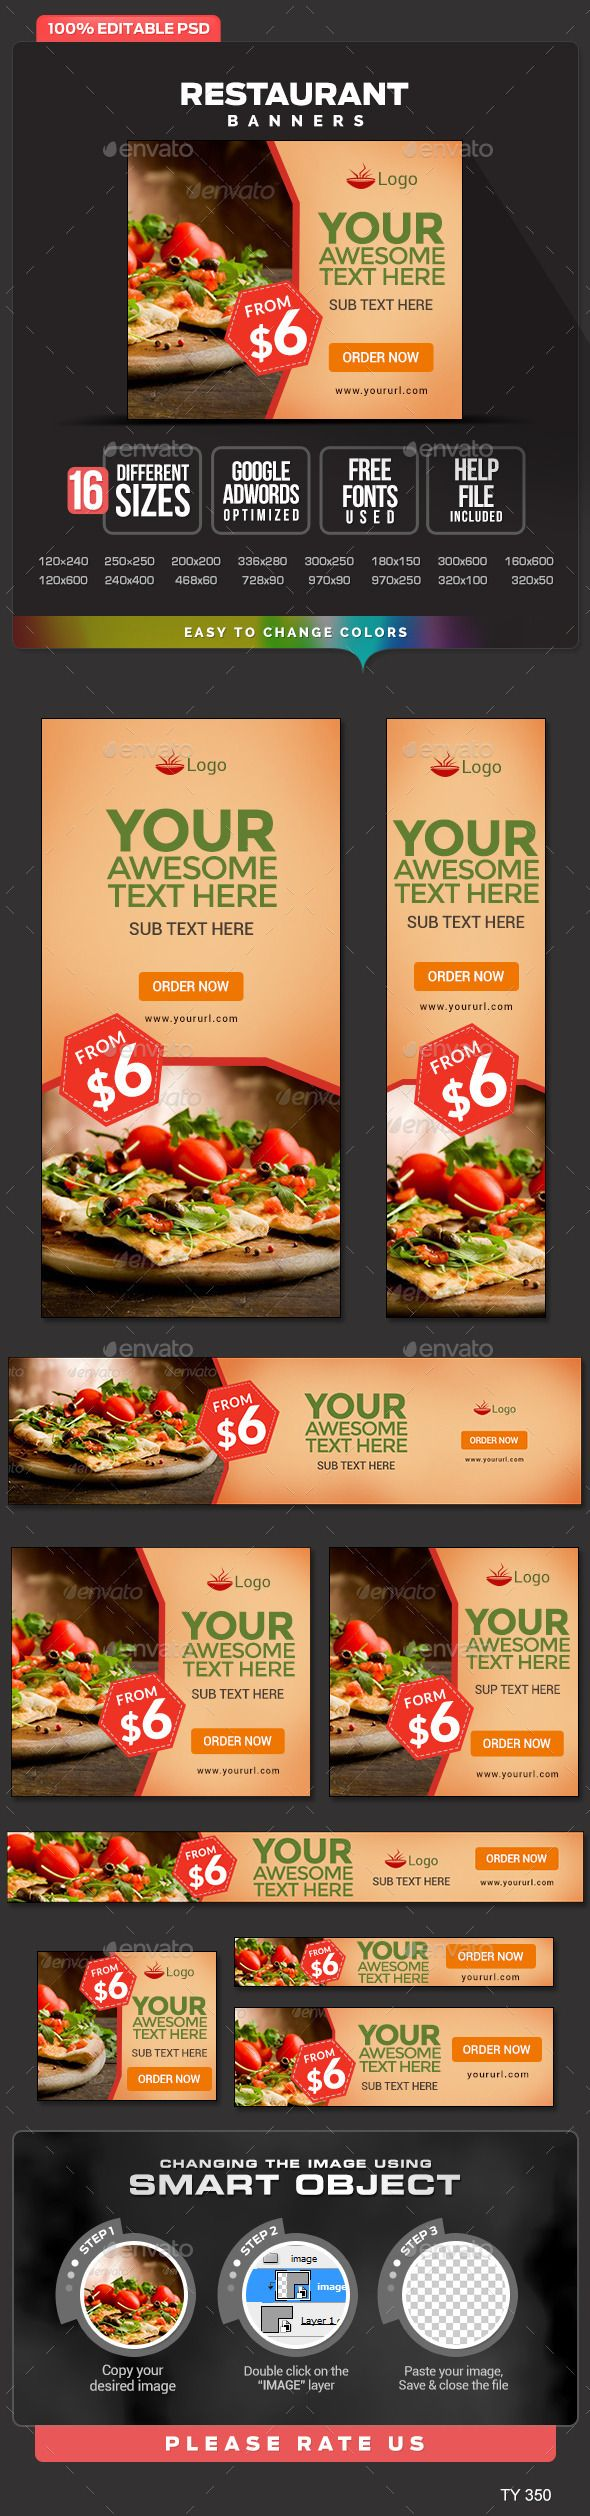 Restaurant web Banners Template PSD #banner #webbanner #design Download: http://graphicriver.net/item/restaurant-banners/10667243?ref=ksioks